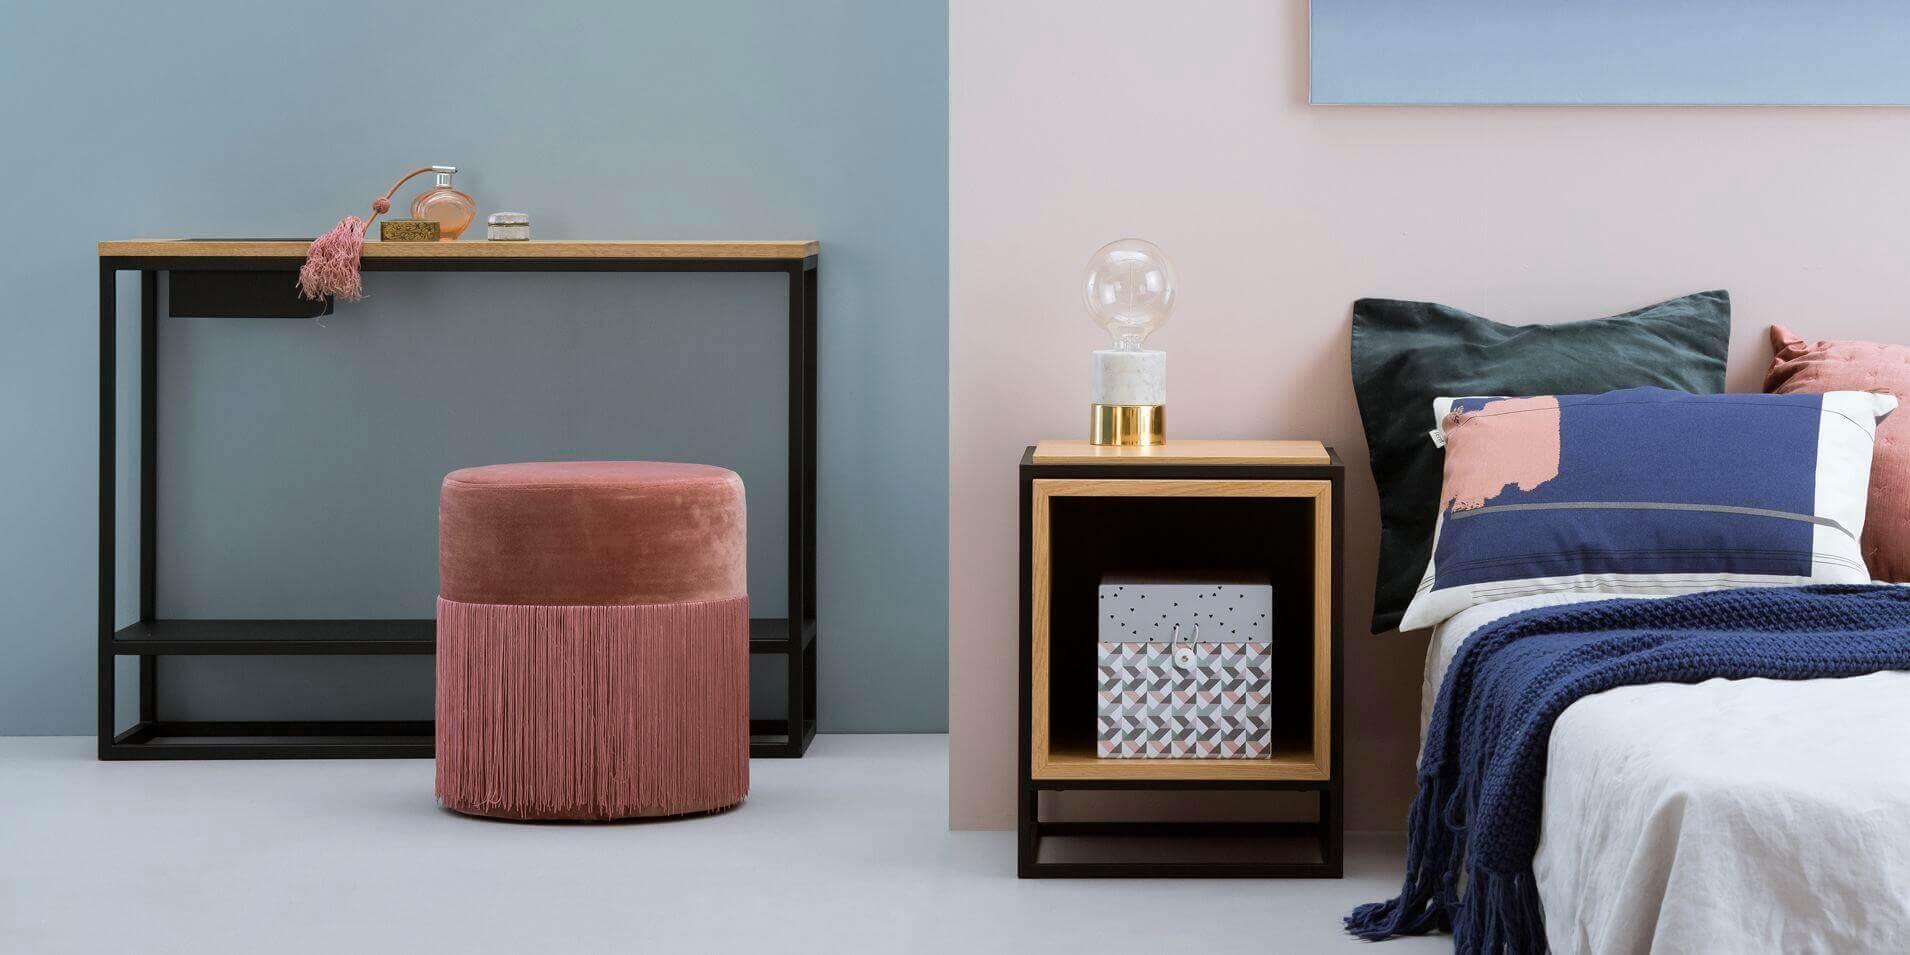 meble design stolik nocny debowy